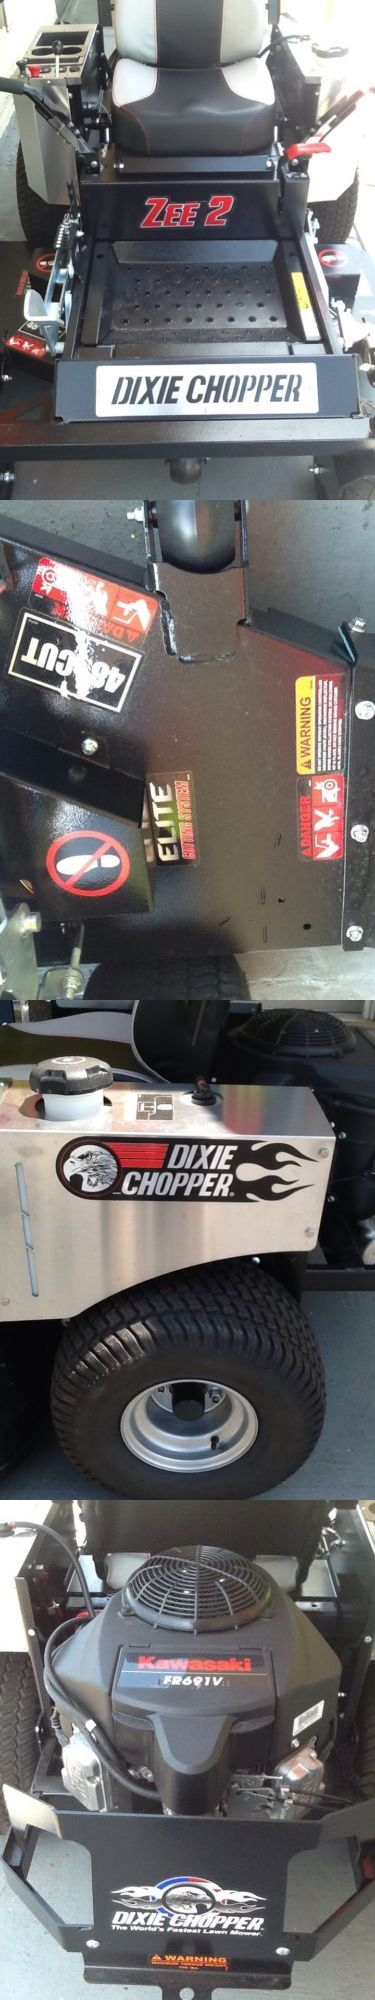 Riding Mowers 177021: Dixie Chopper Zee 2 (48 ) 23 Hp Kawasaki Zero Turn Mower 2017 -> BUY IT NOW ONLY: $4399 on eBay!